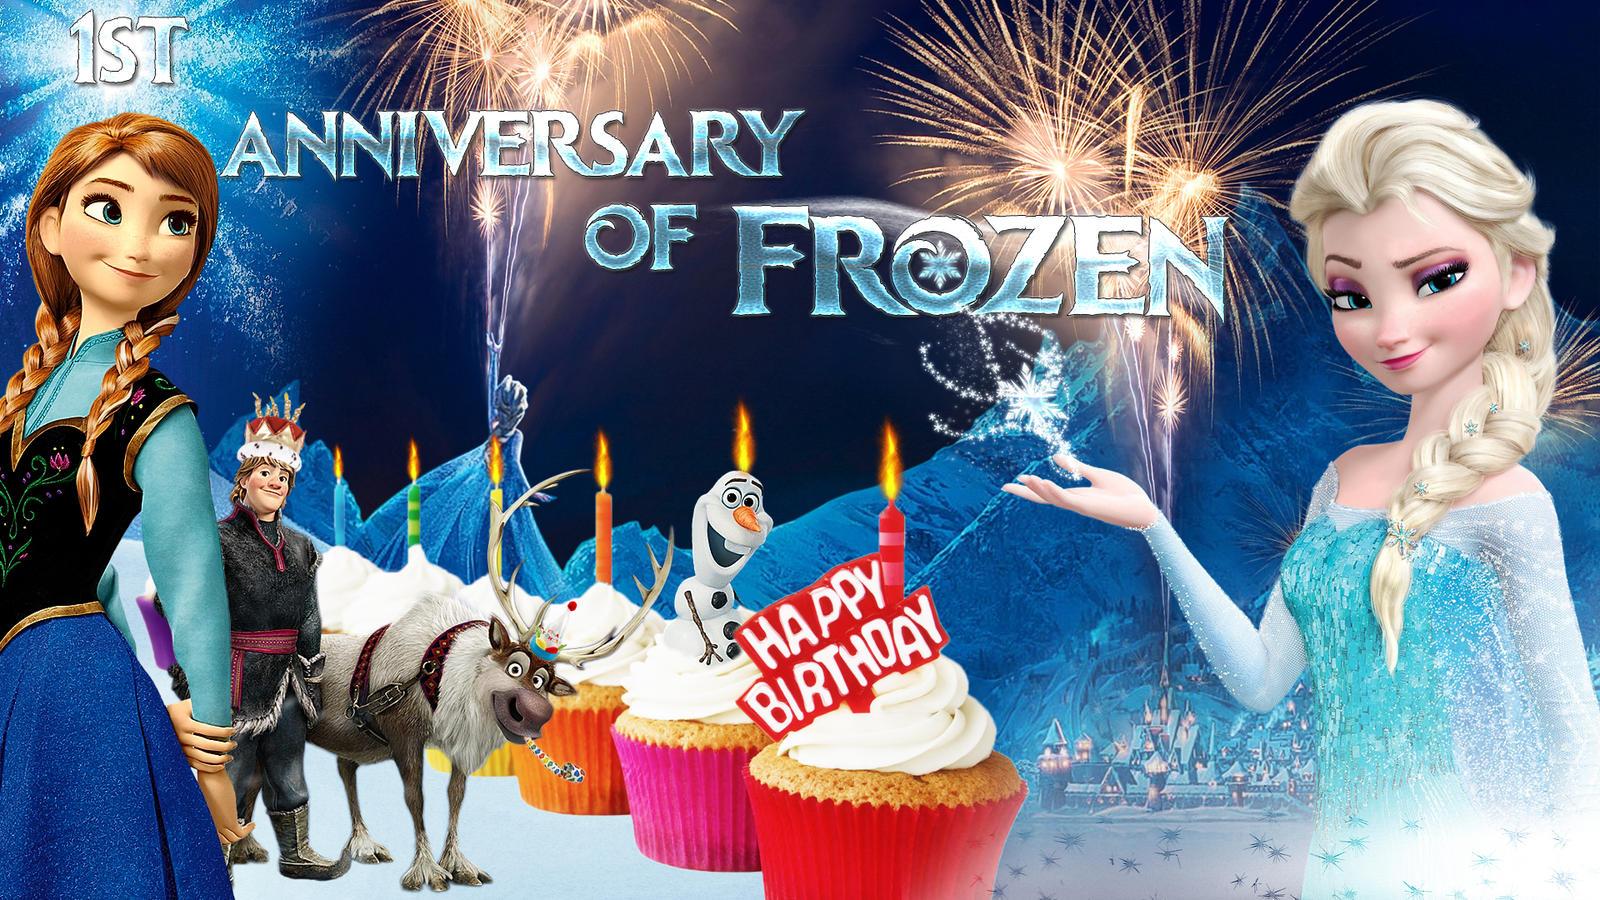 frozen  1920x1080 happy birthday frozencographic on